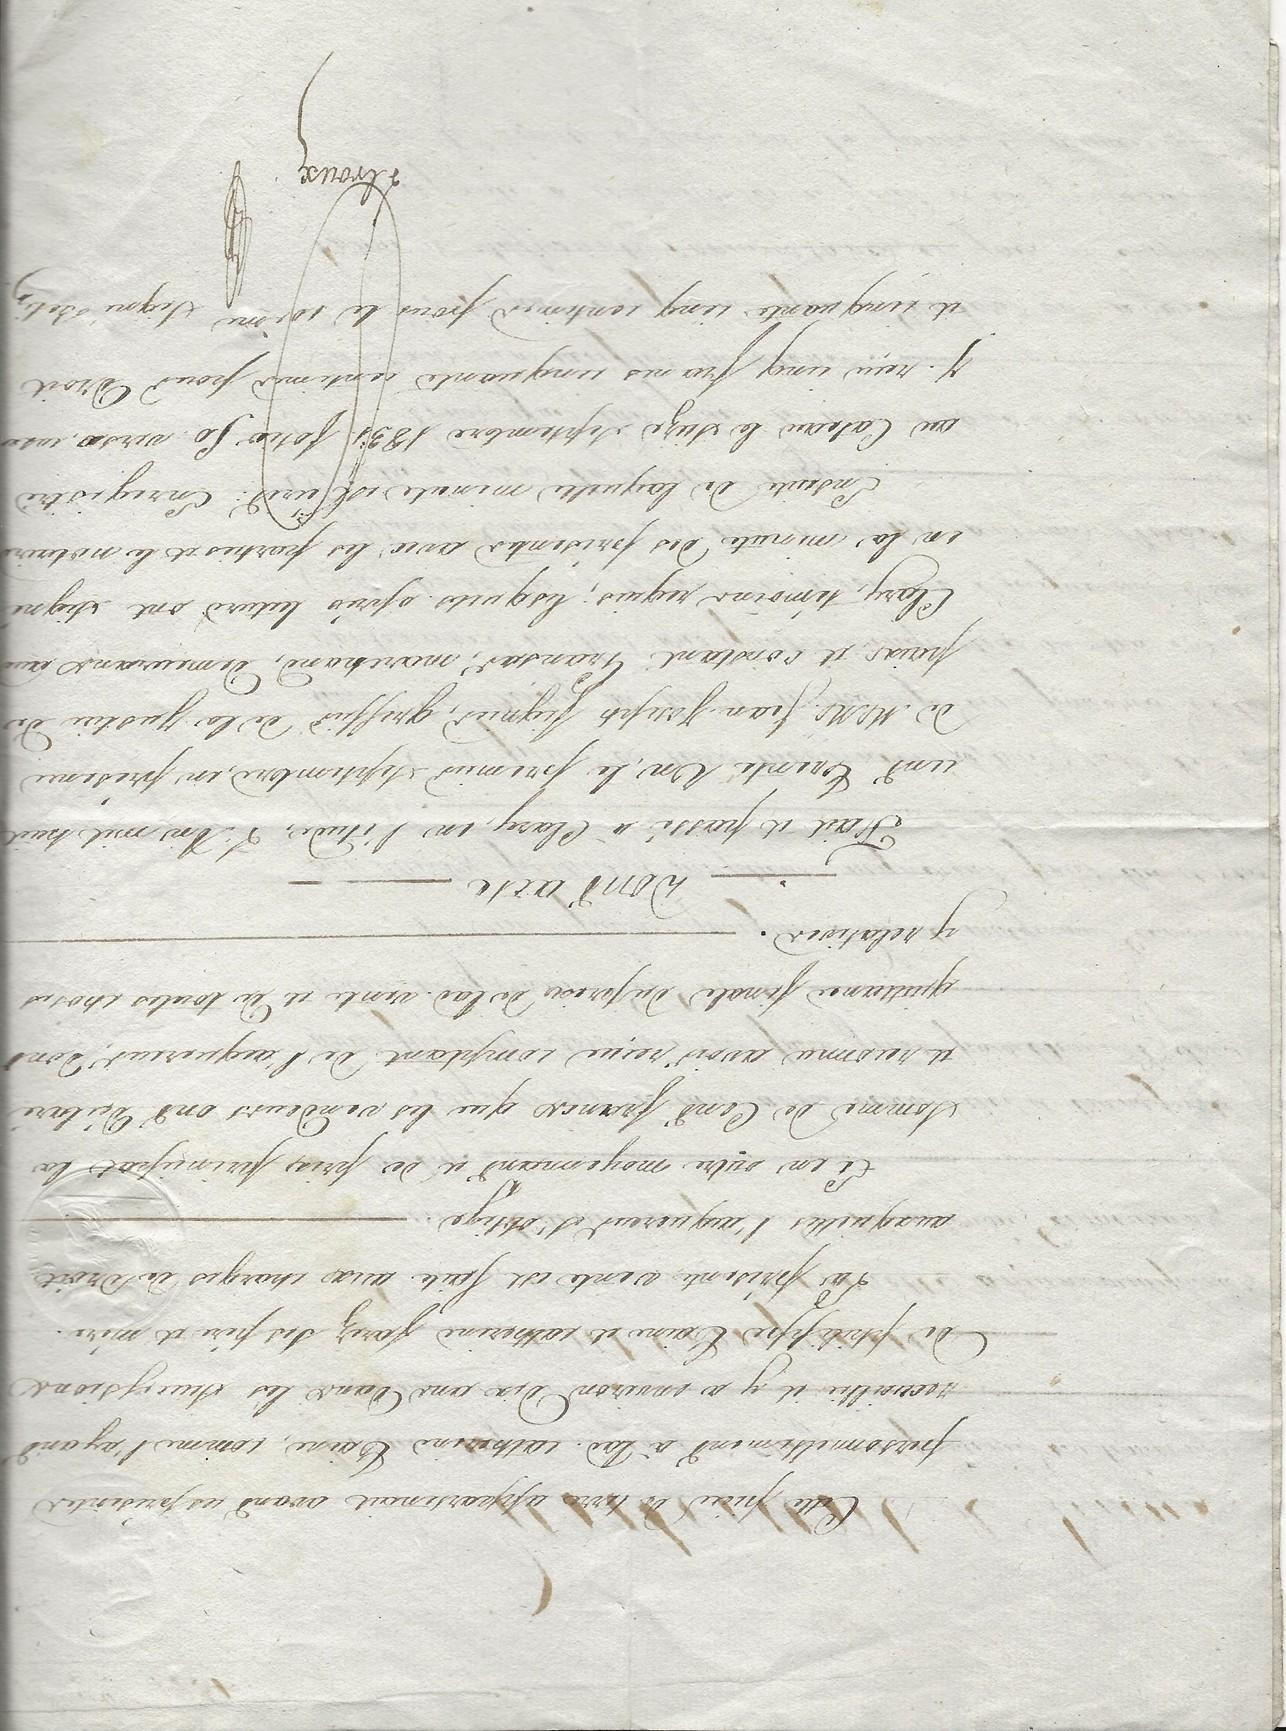 1731 vente terrain ch morcrette a pierre jh pruvot 002